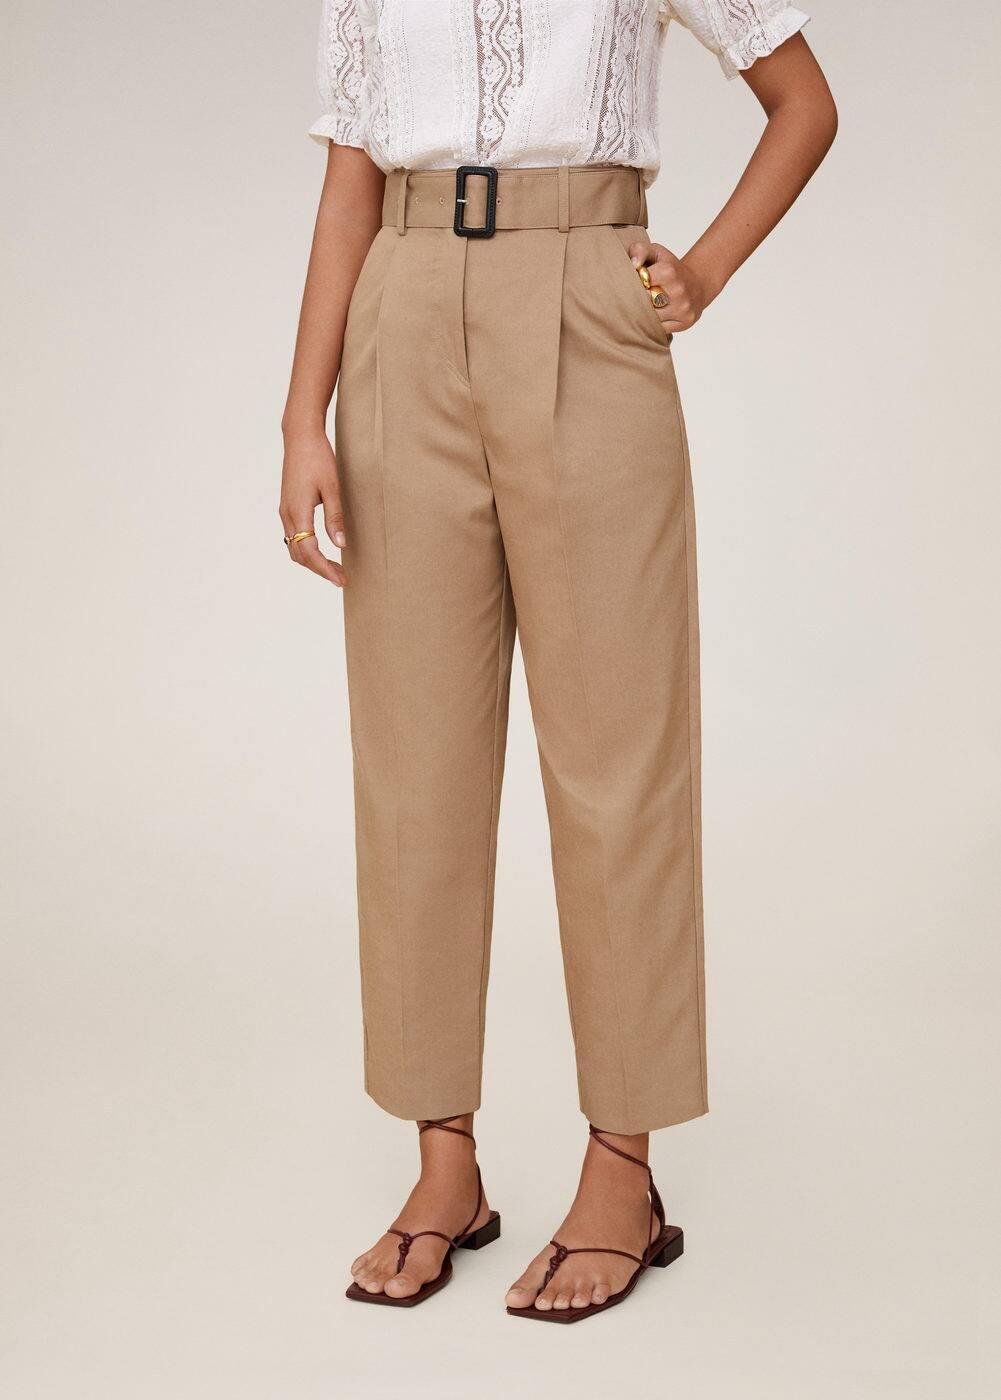 m-cesi:pantalon recto cinturon